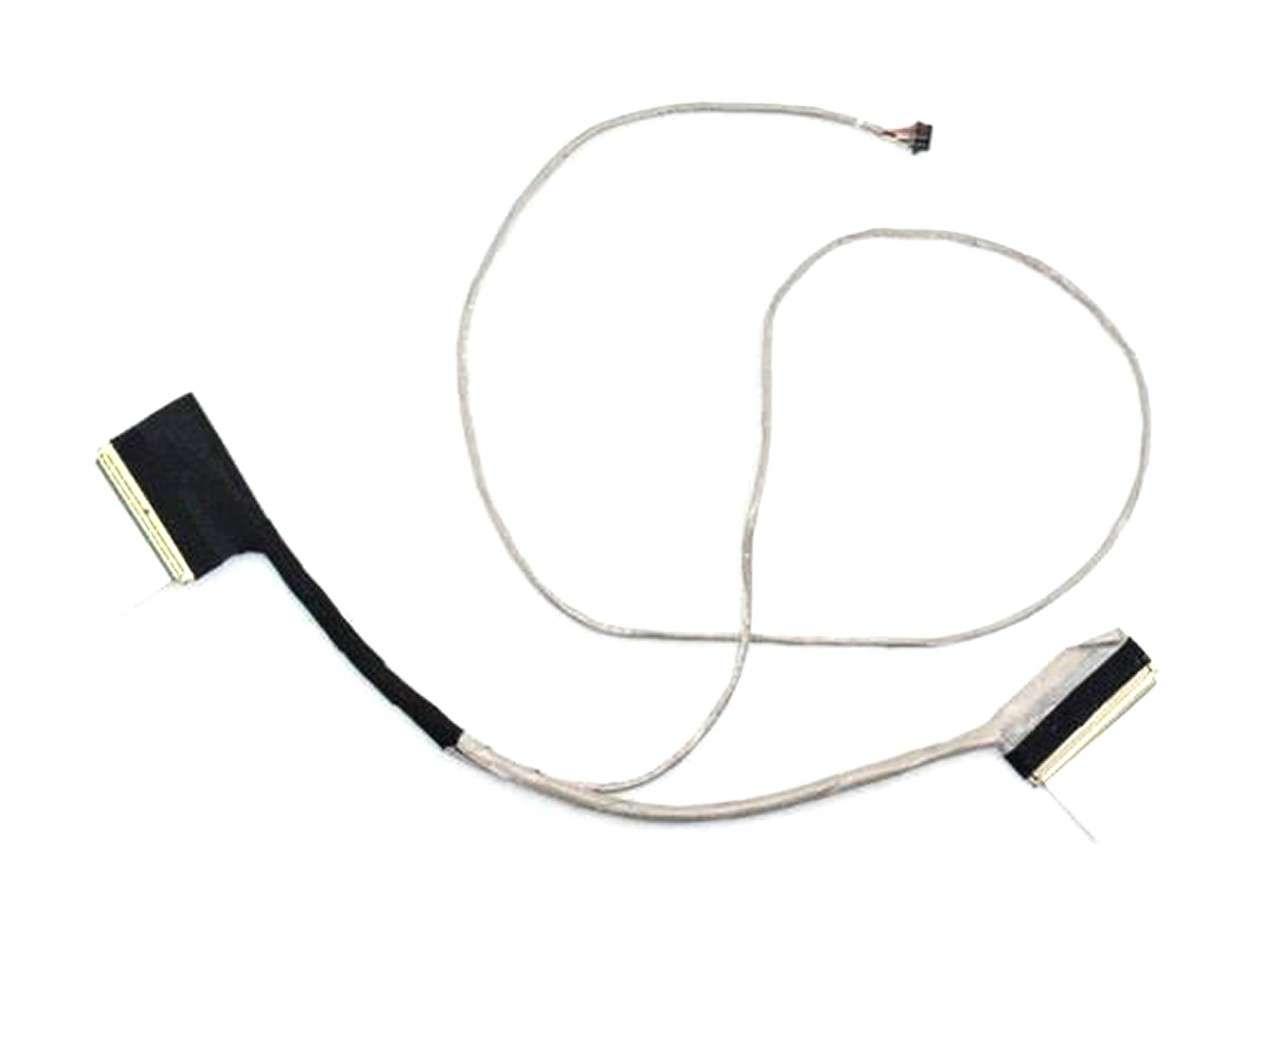 Cablu video LVDS Asus X403MA imagine powerlaptop.ro 2021